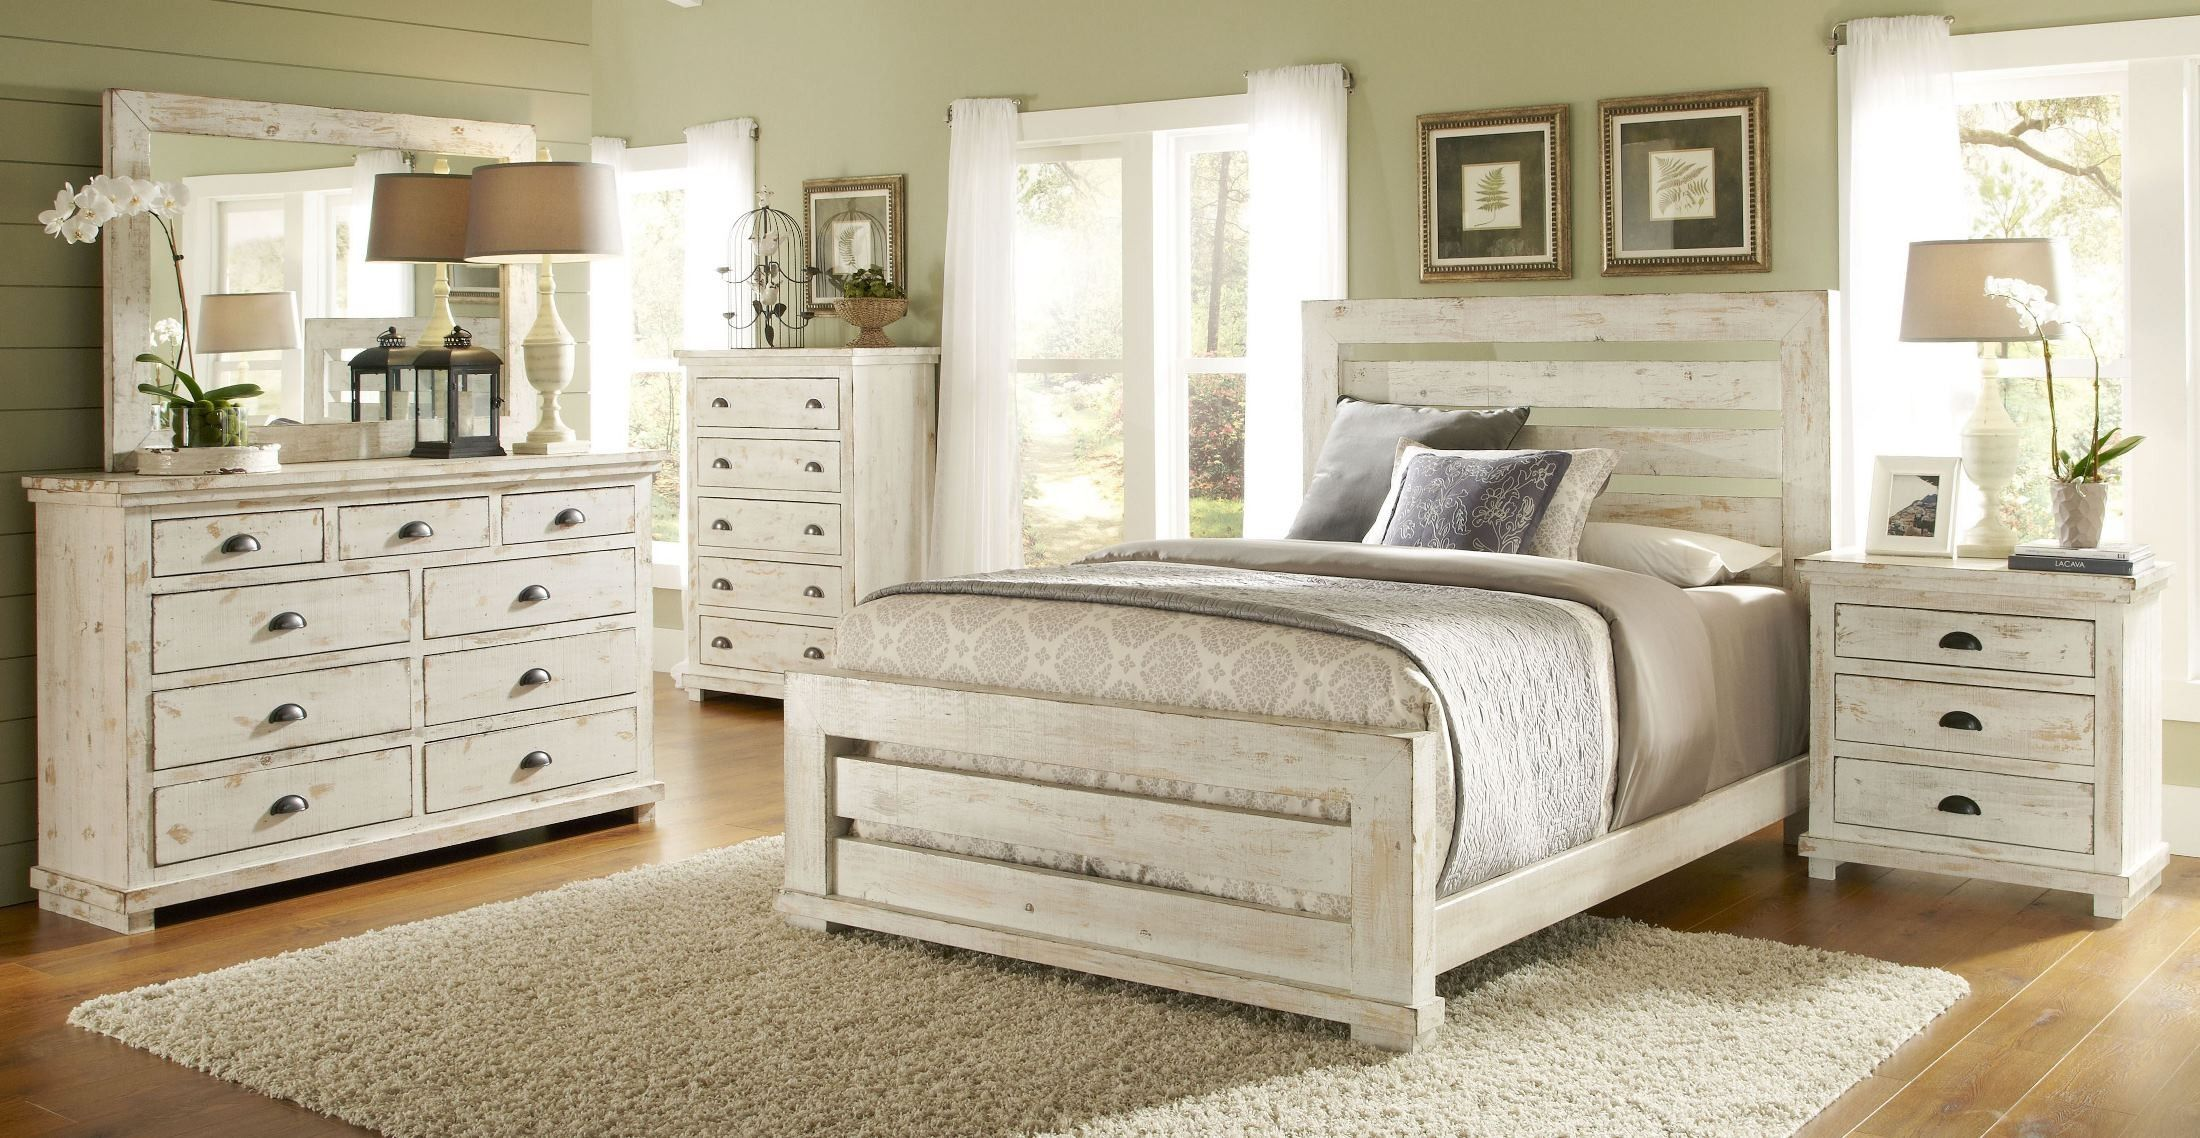 1stopbedrooms Com Distressed White Bedroom Furniture Distressed Bedroom Furniture Upholstered Bedroom Set